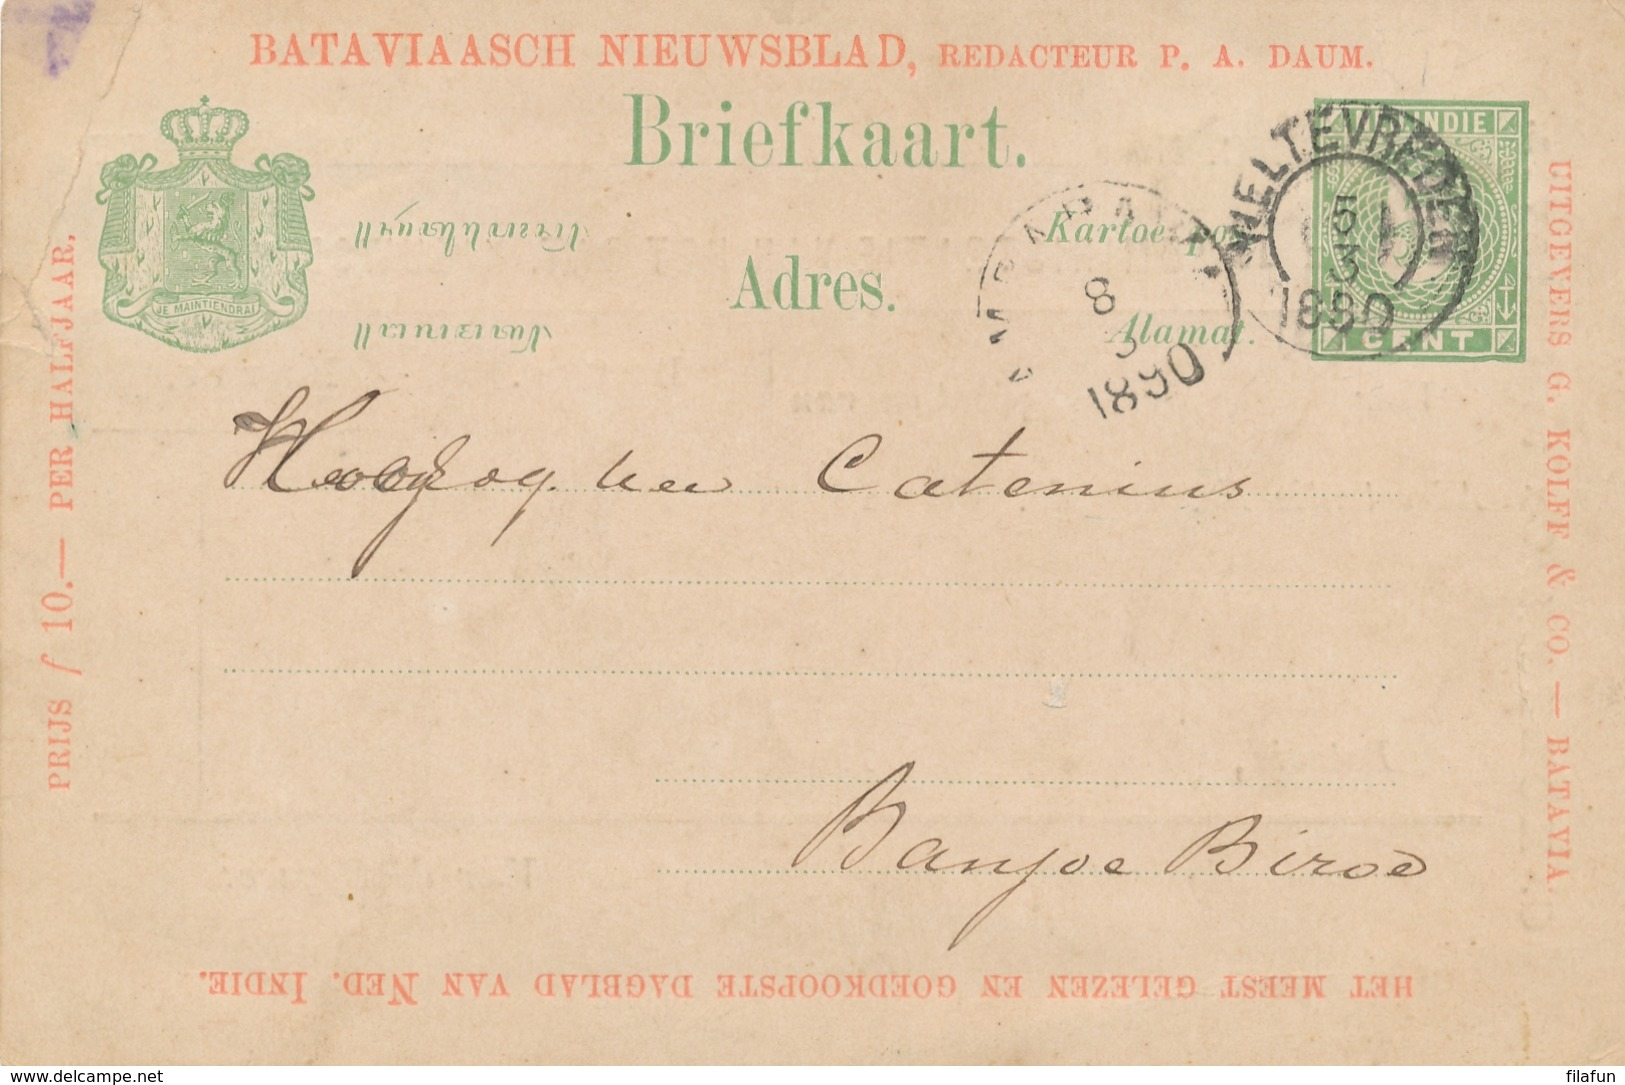 Nederlands Indië - 1890 - 5 Cent Cijfer, Briefkaart G8a Particulier Bedrukt Bataviaasch Nieuwsblad Naar Banjoe Biroe - Indes Néerlandaises